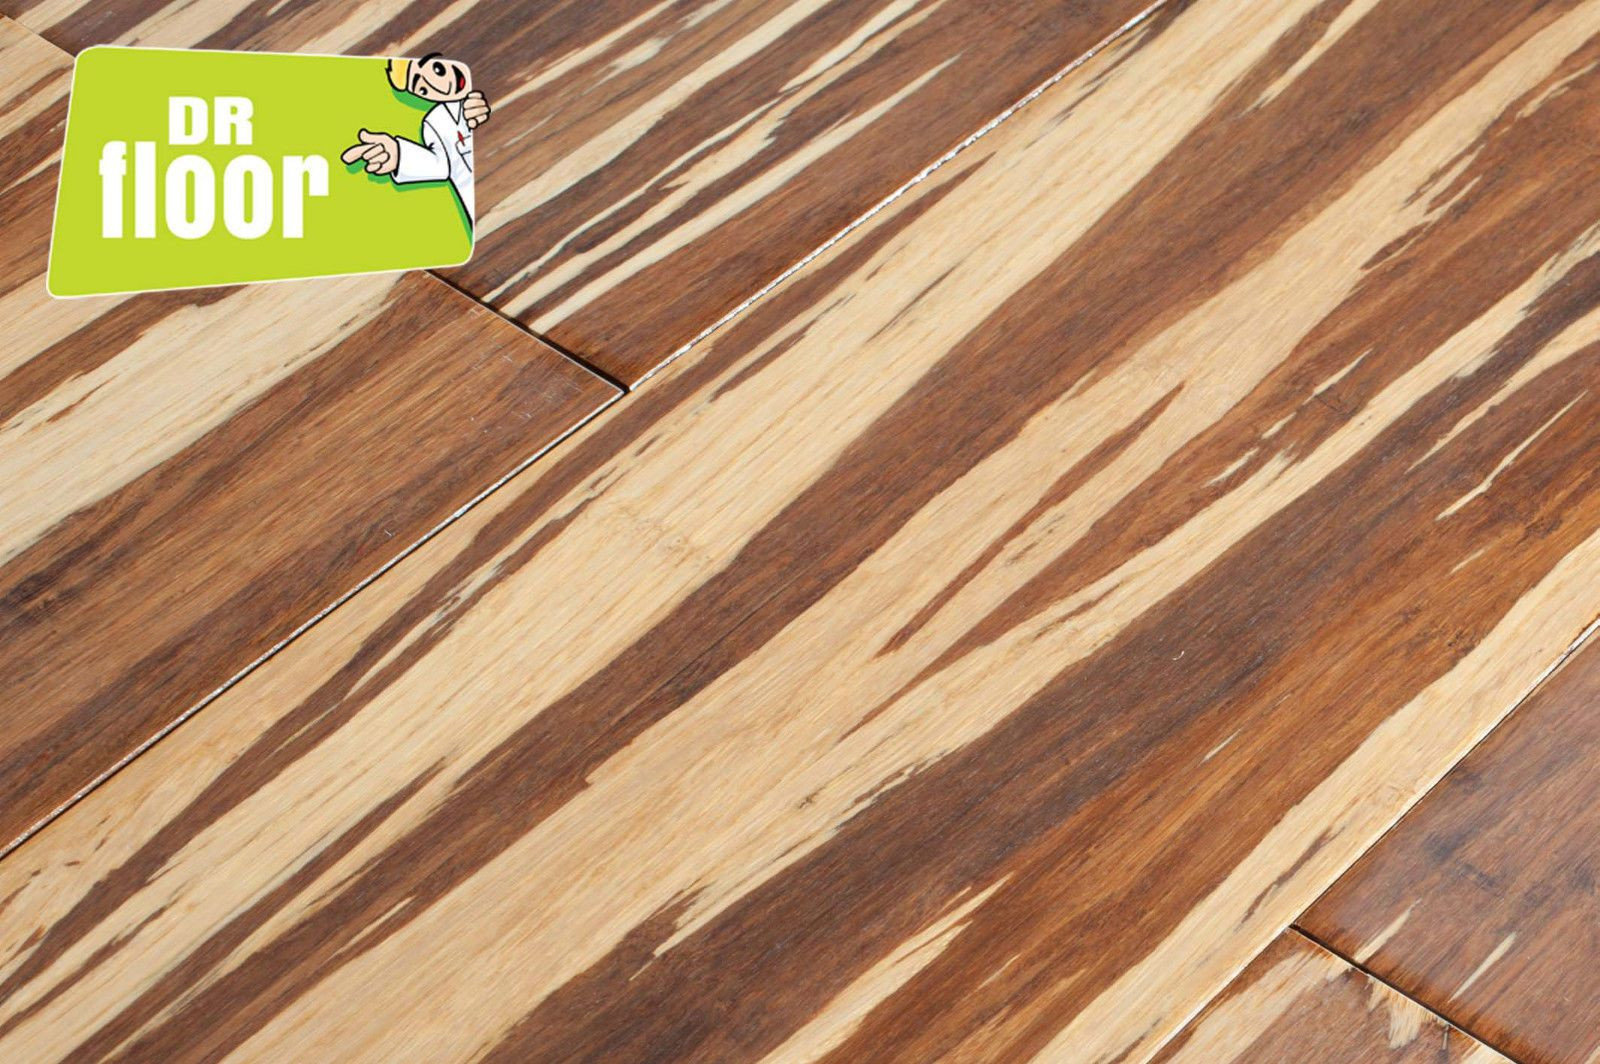 strand bamboo hardwood flooring of solid tigerwood strand woven bamboo 142mm wood flooring ebay within solid tigerwood strand woven bamboo 142mm wood flooring ebay